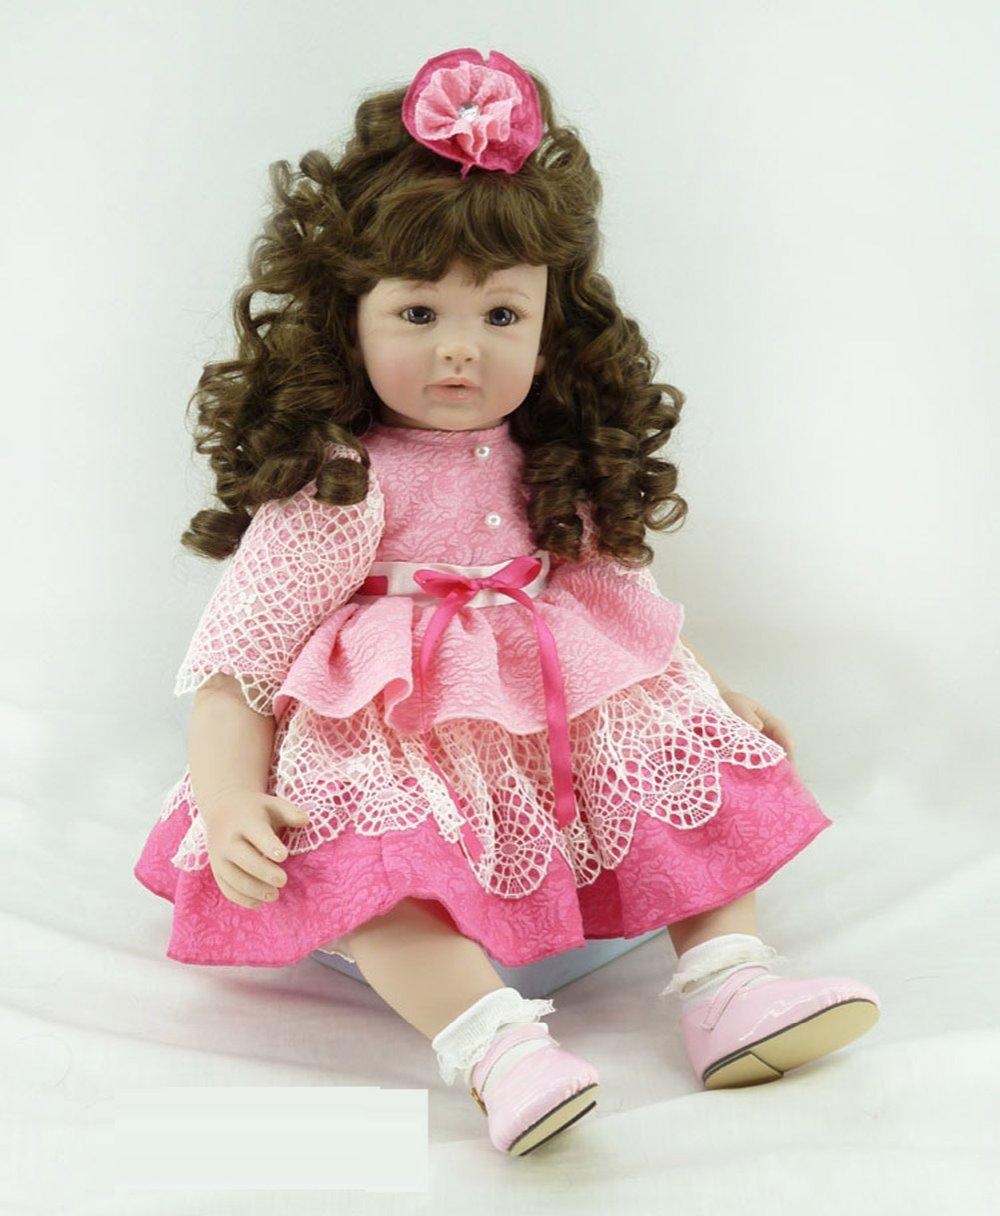 22 inch 55 cm Silicone baby reborn dolls lifelike doll reborn babies toys Pretty girl with